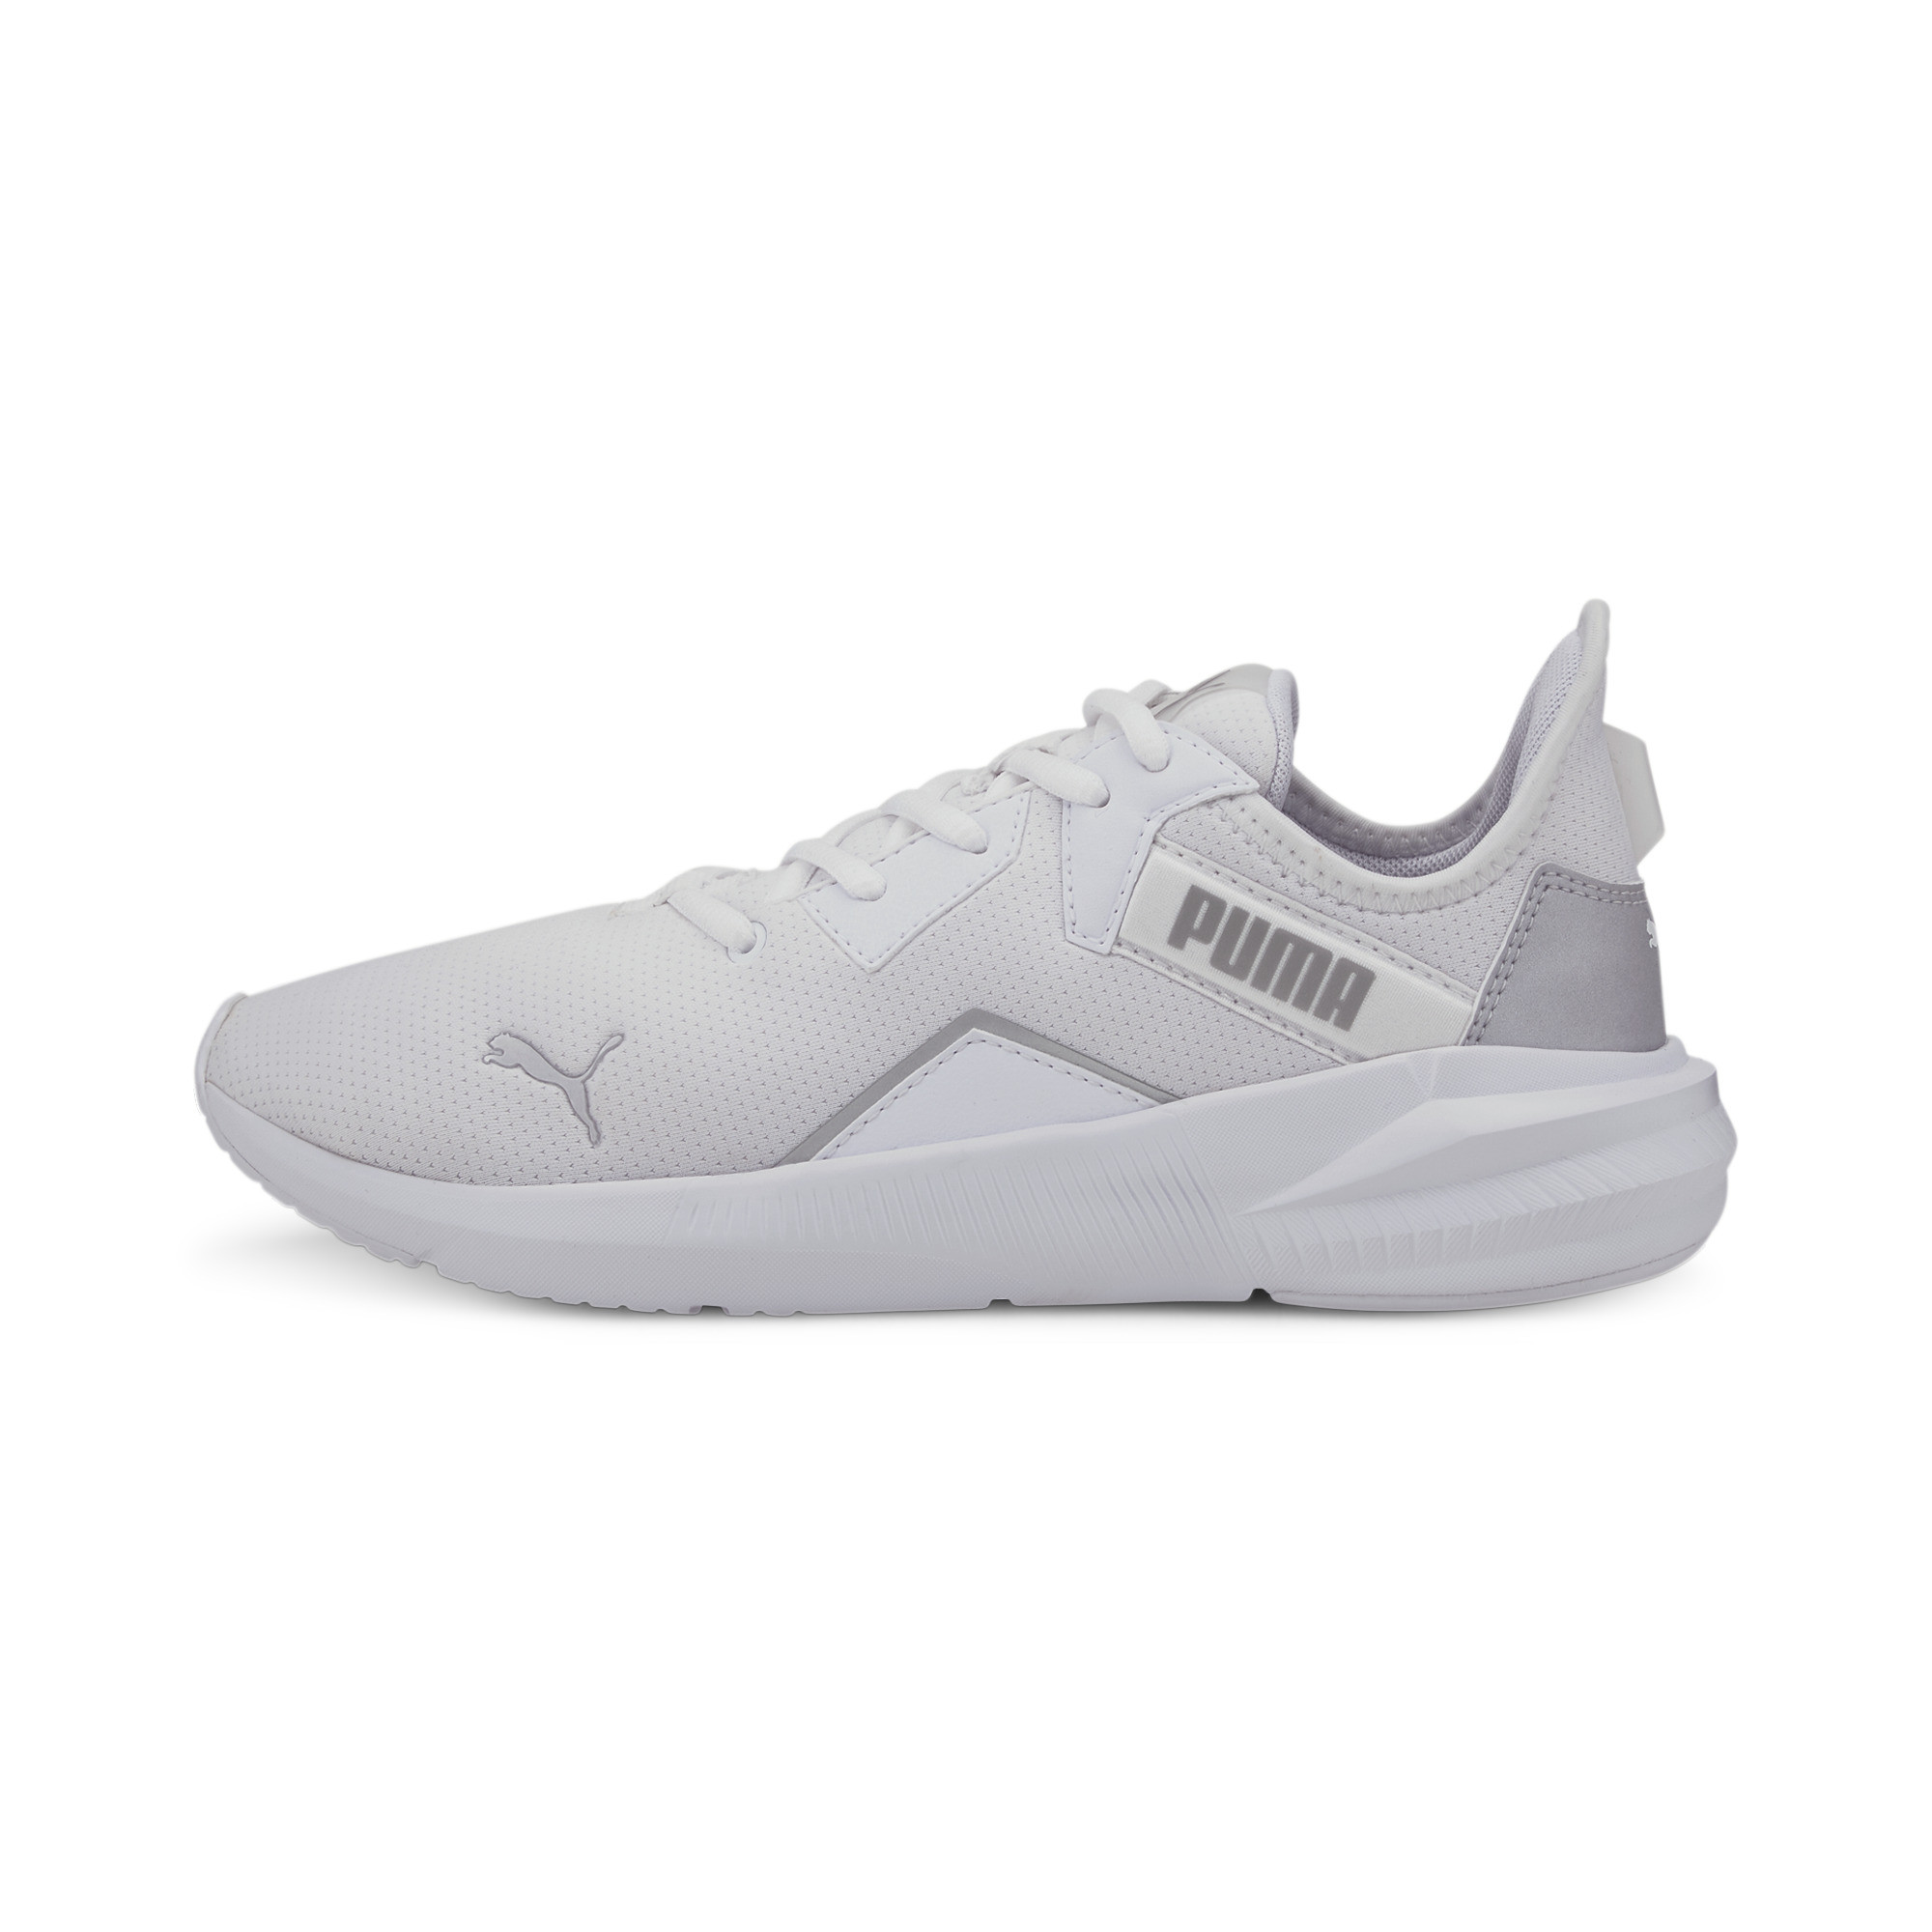 thumbnail 25 - PUMA-Women-039-s-Platinum-Training-Shoes